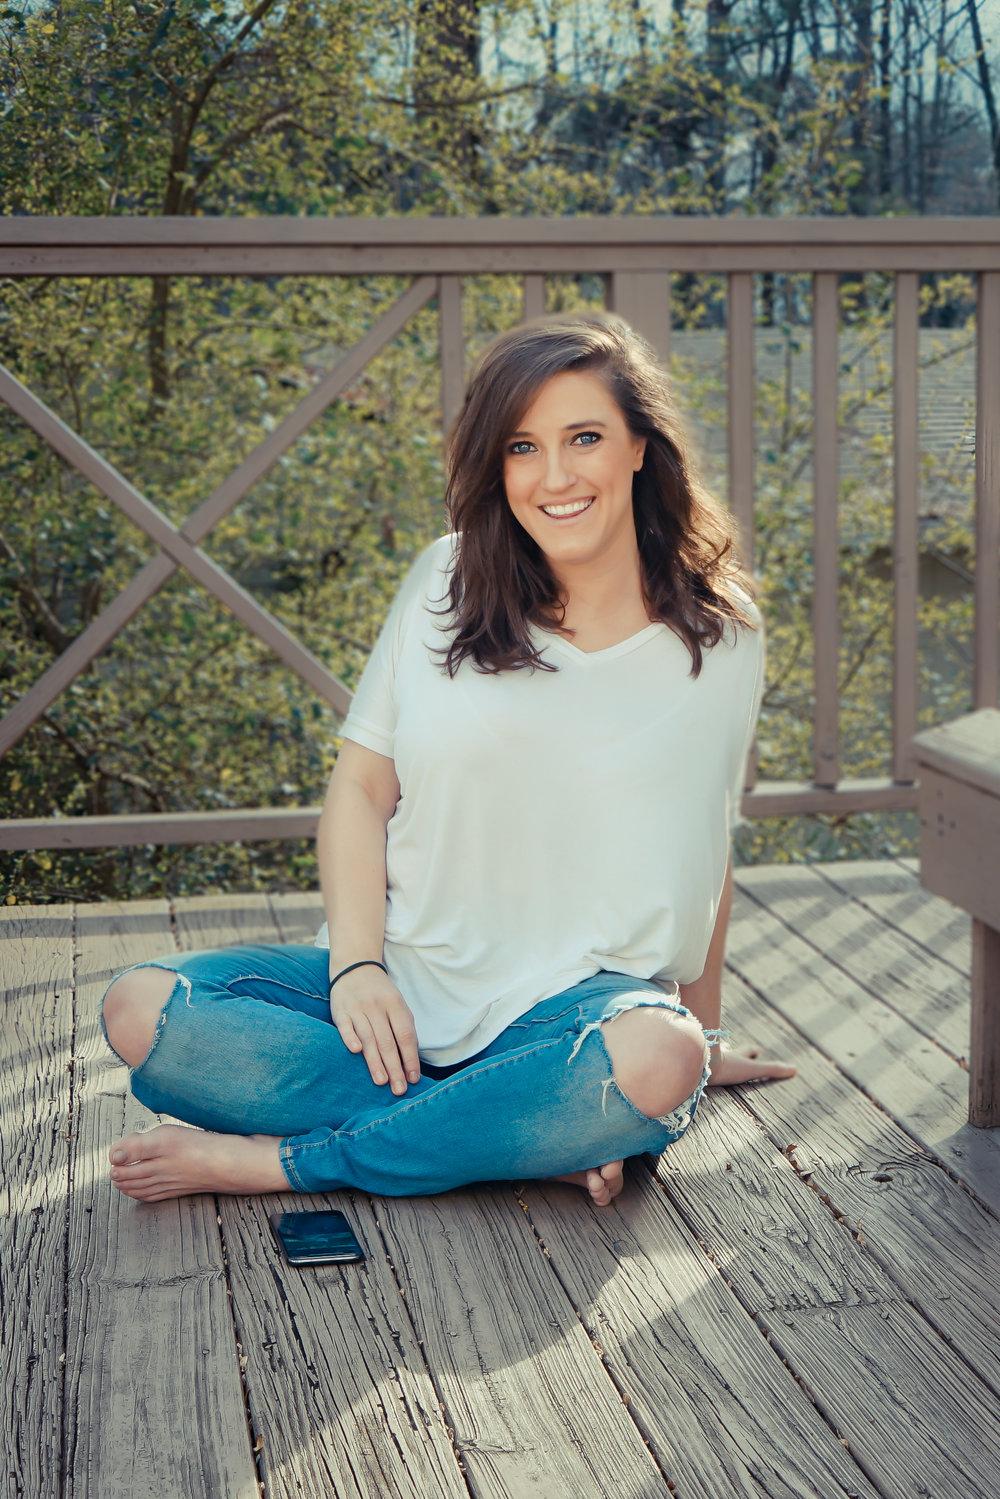 Meet Courtney, founder of @ctbcreatives